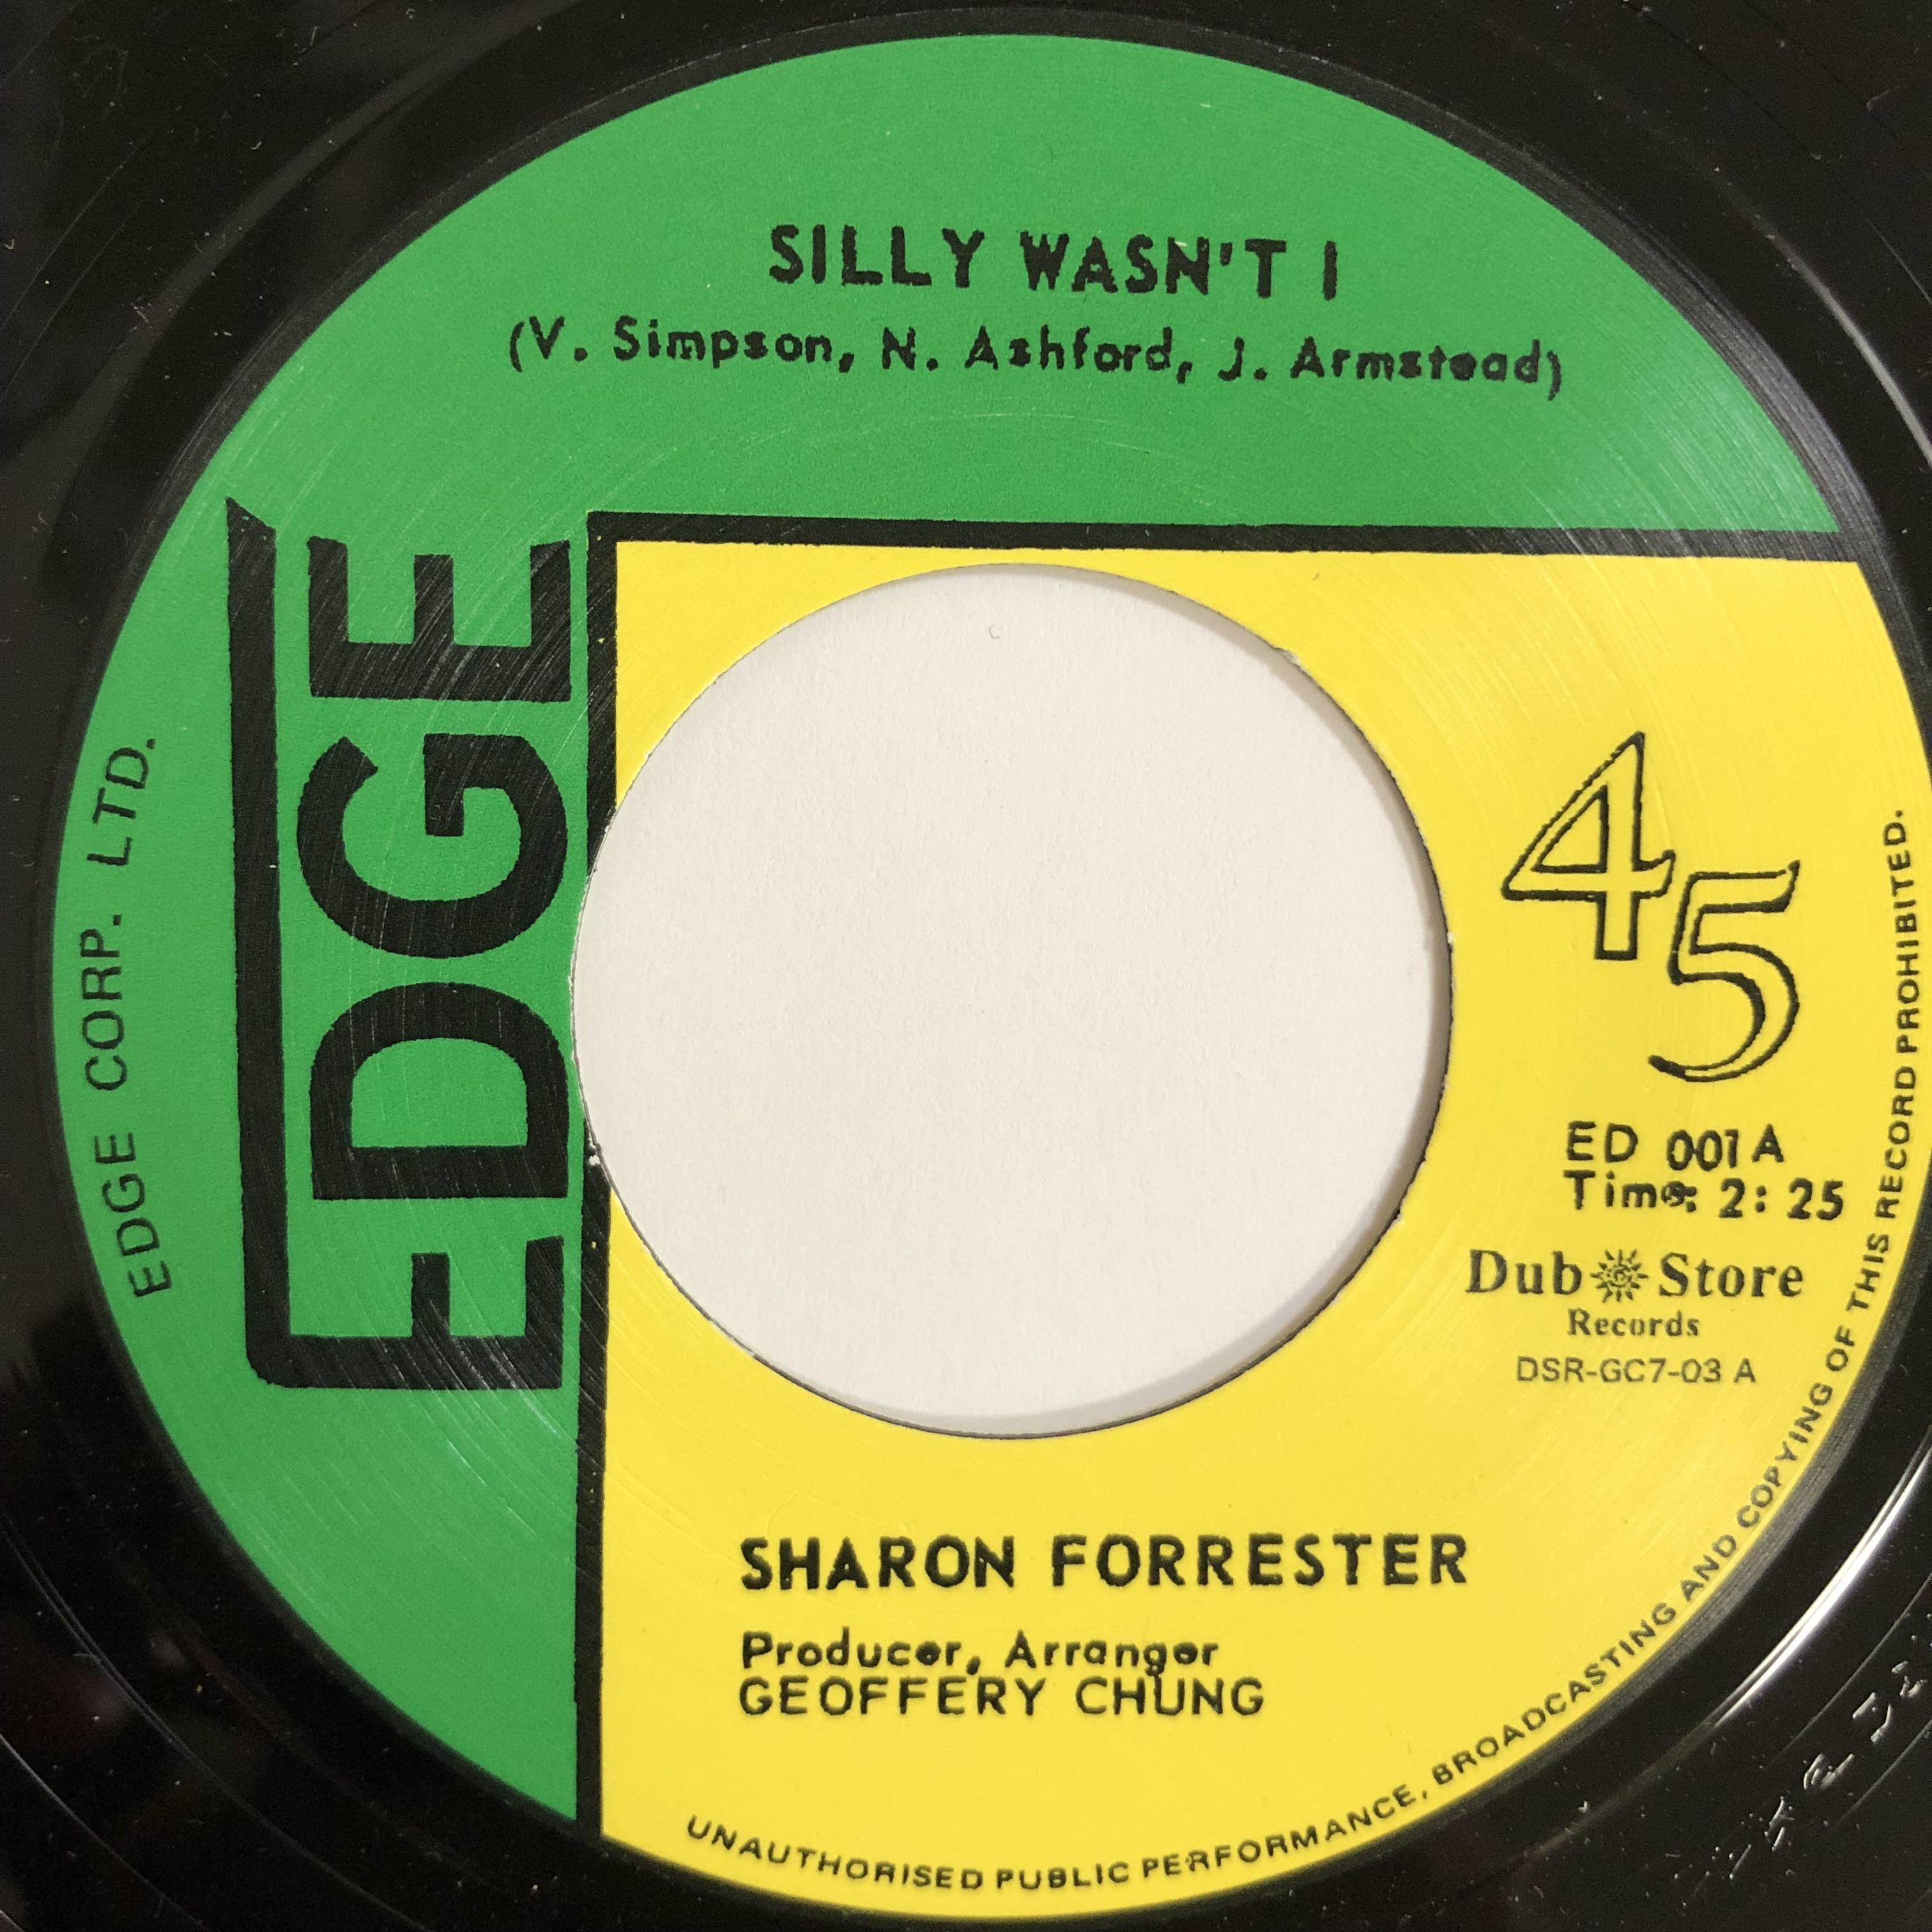 Sharon Forrester(シャロンフォレスター) - Silly Wasn't It【7-20200】